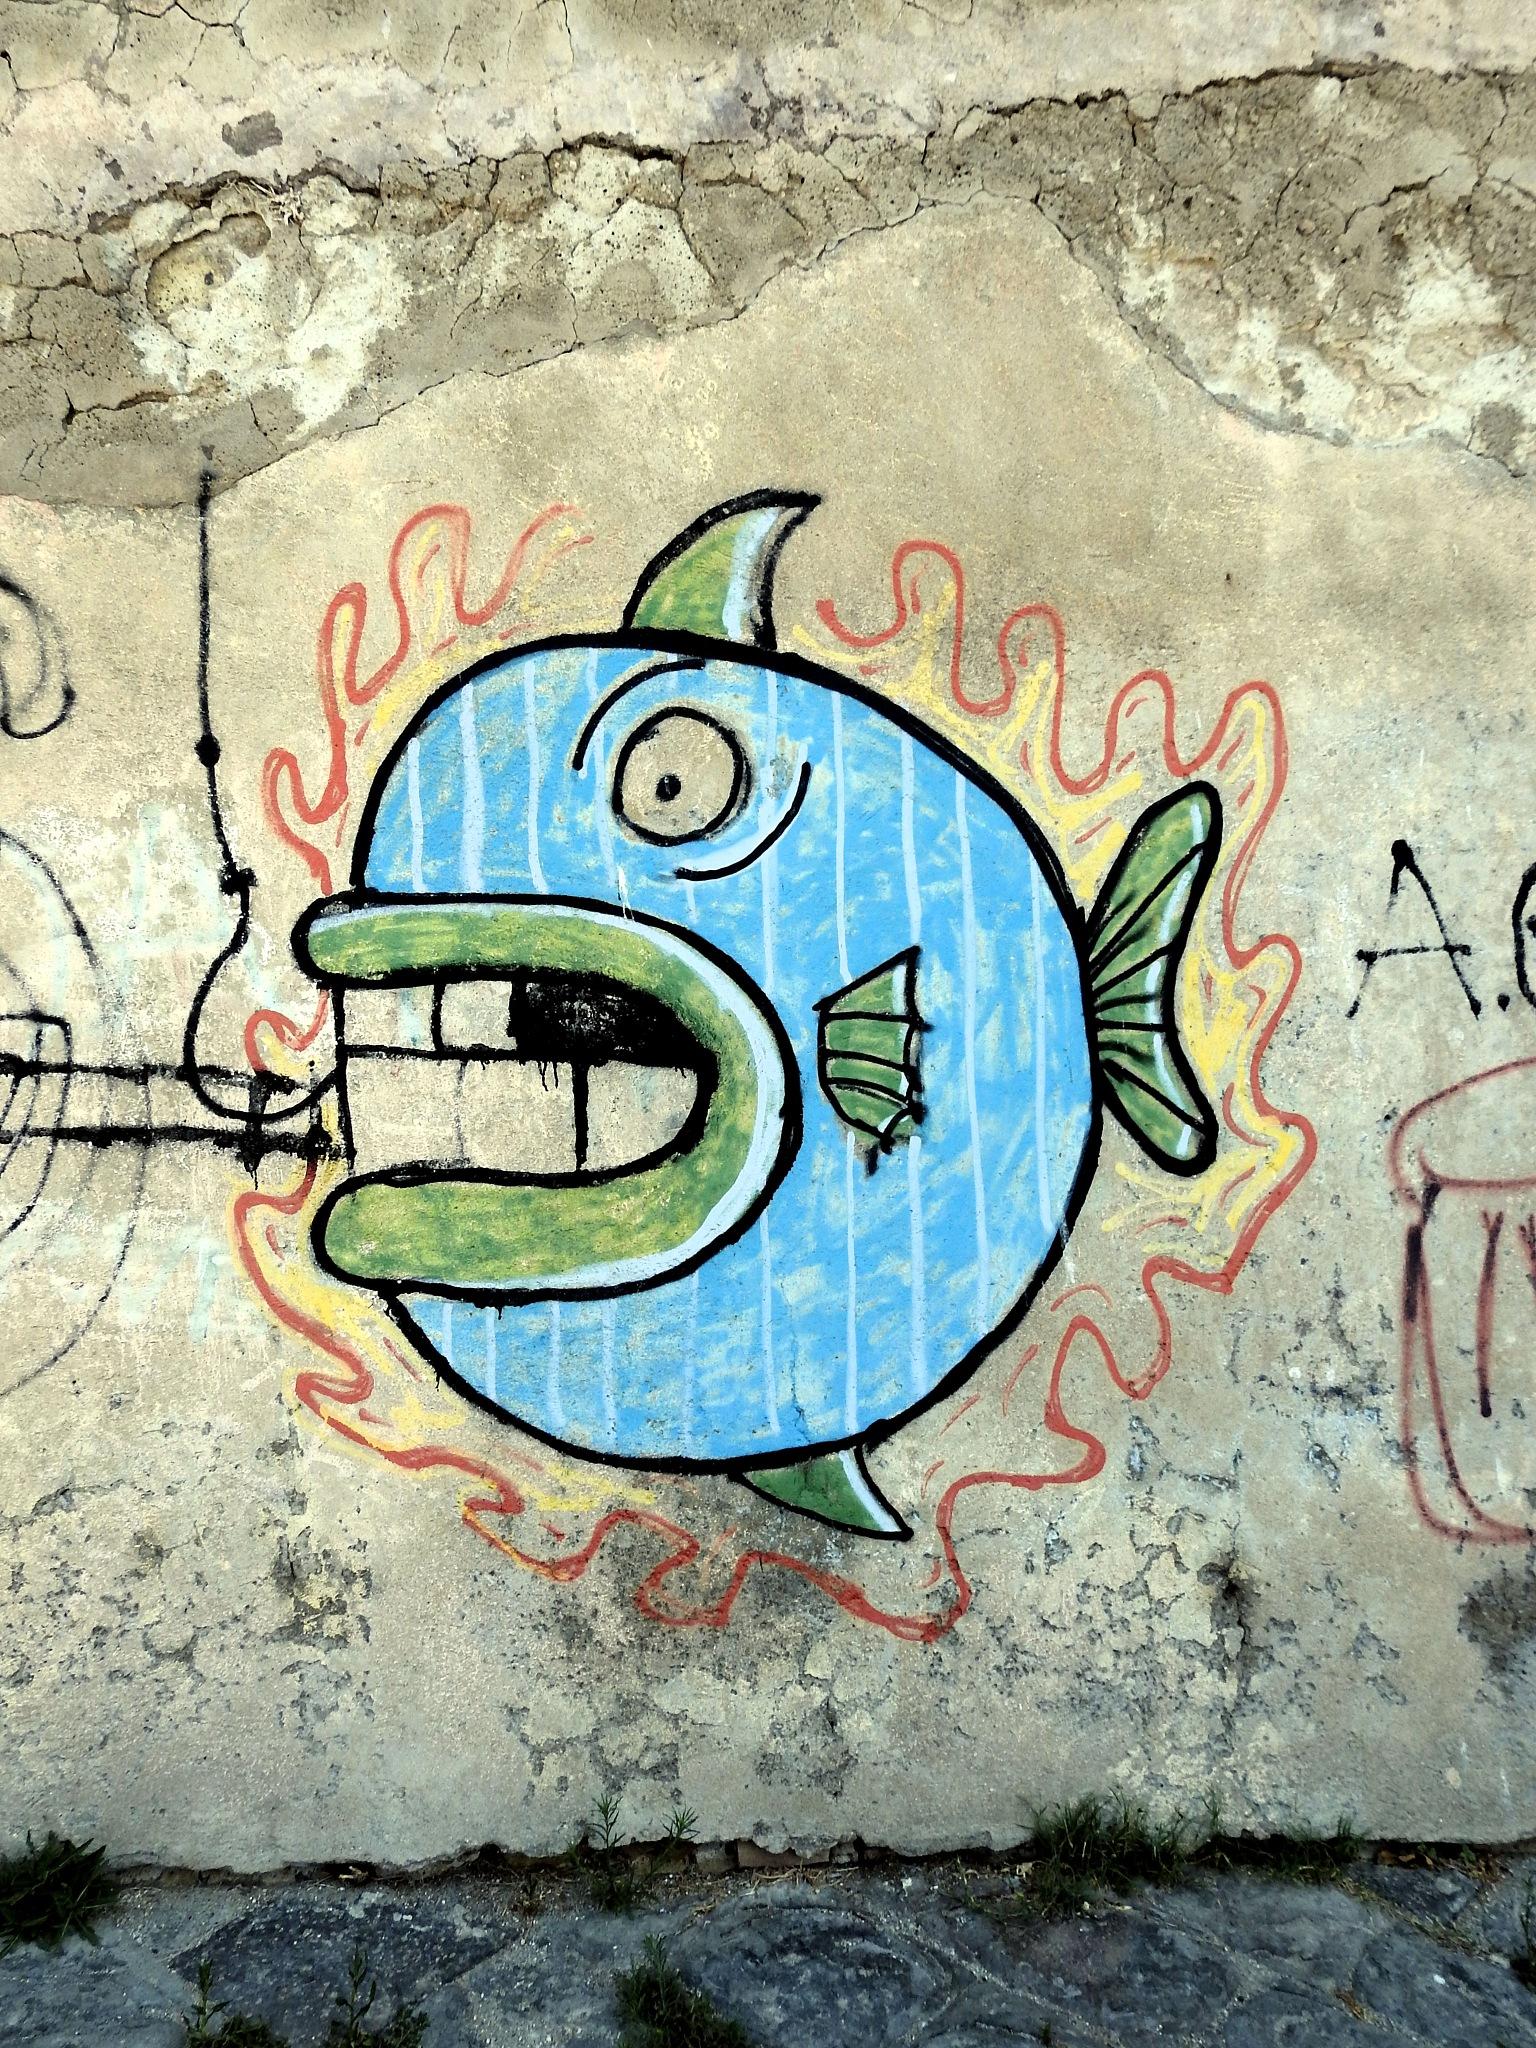 Procida [Naples] - The Big Fish  by Delirium Tremends 62